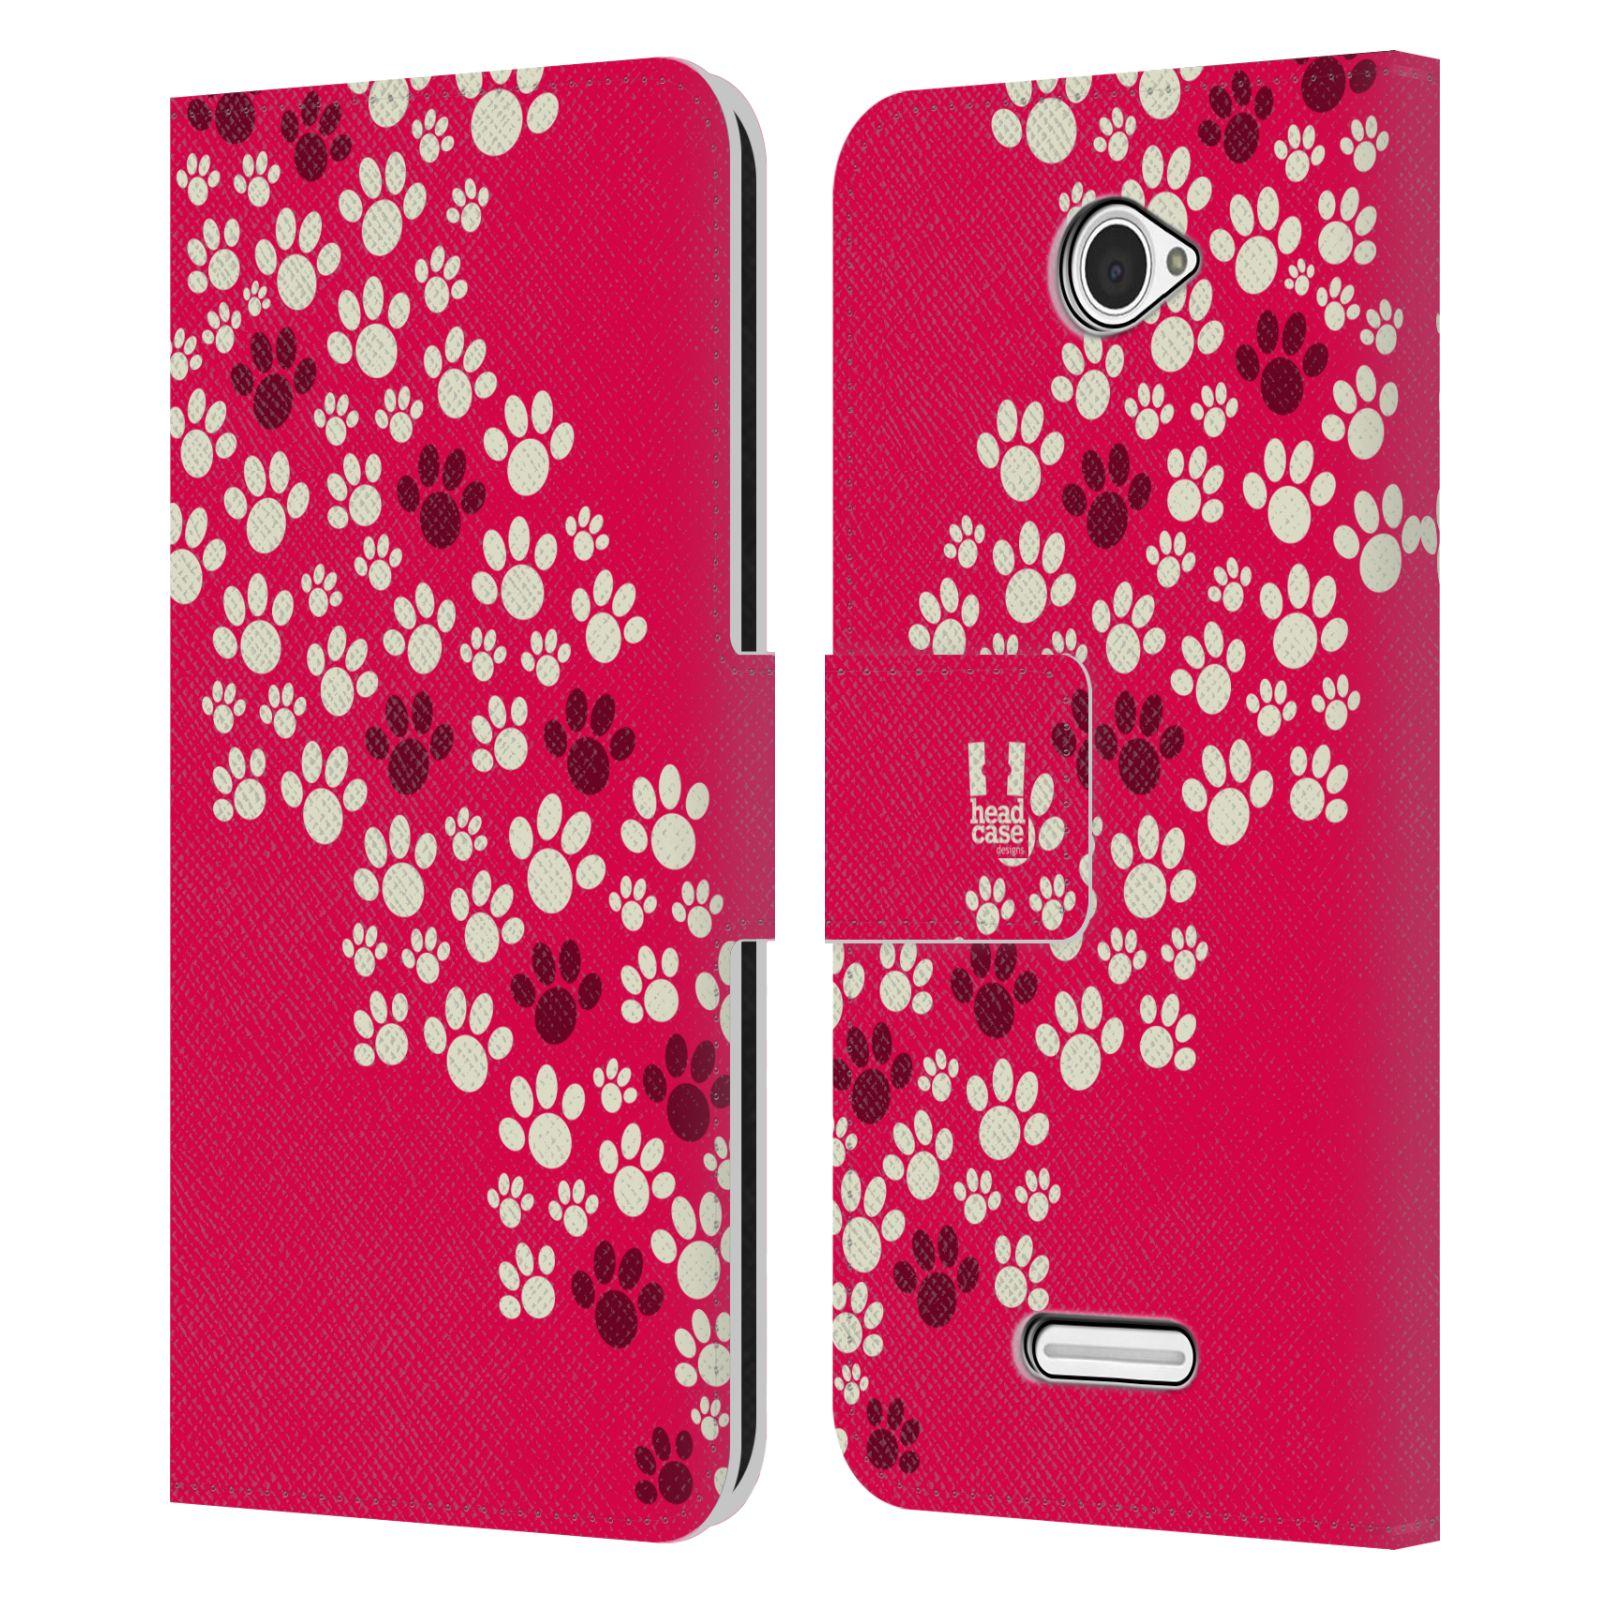 HEAD CASE Flipové pouzdro pro mobil SONY XPERIA E4 Pejsek ťapky růžová barva